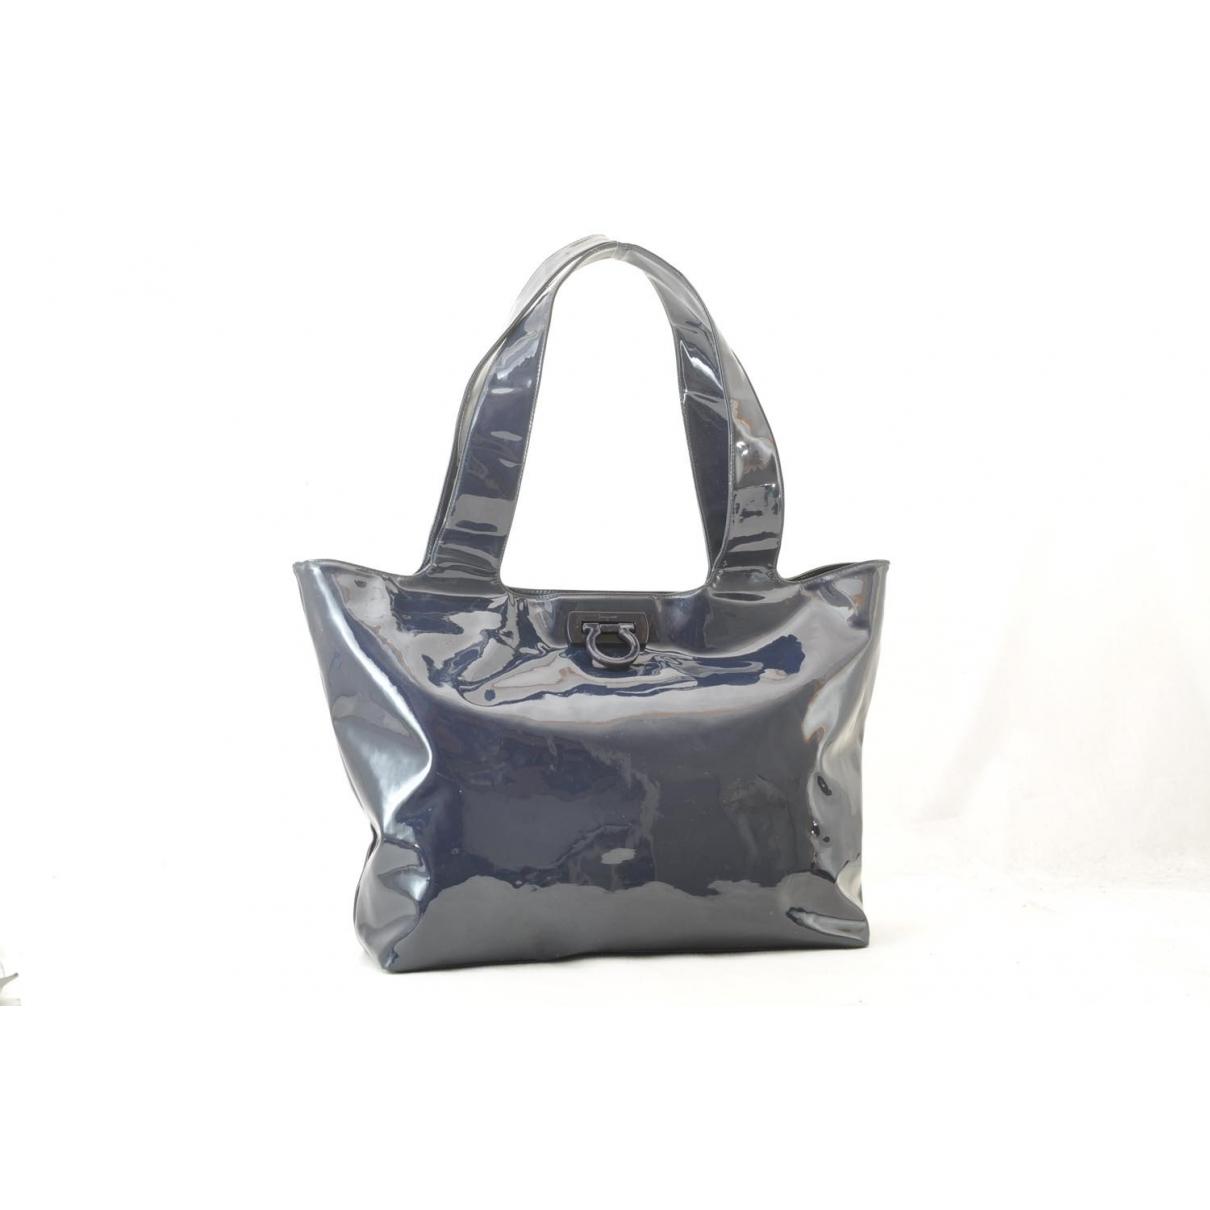 Salvatore Ferragamo \N Blue Patent leather handbag for Women \N